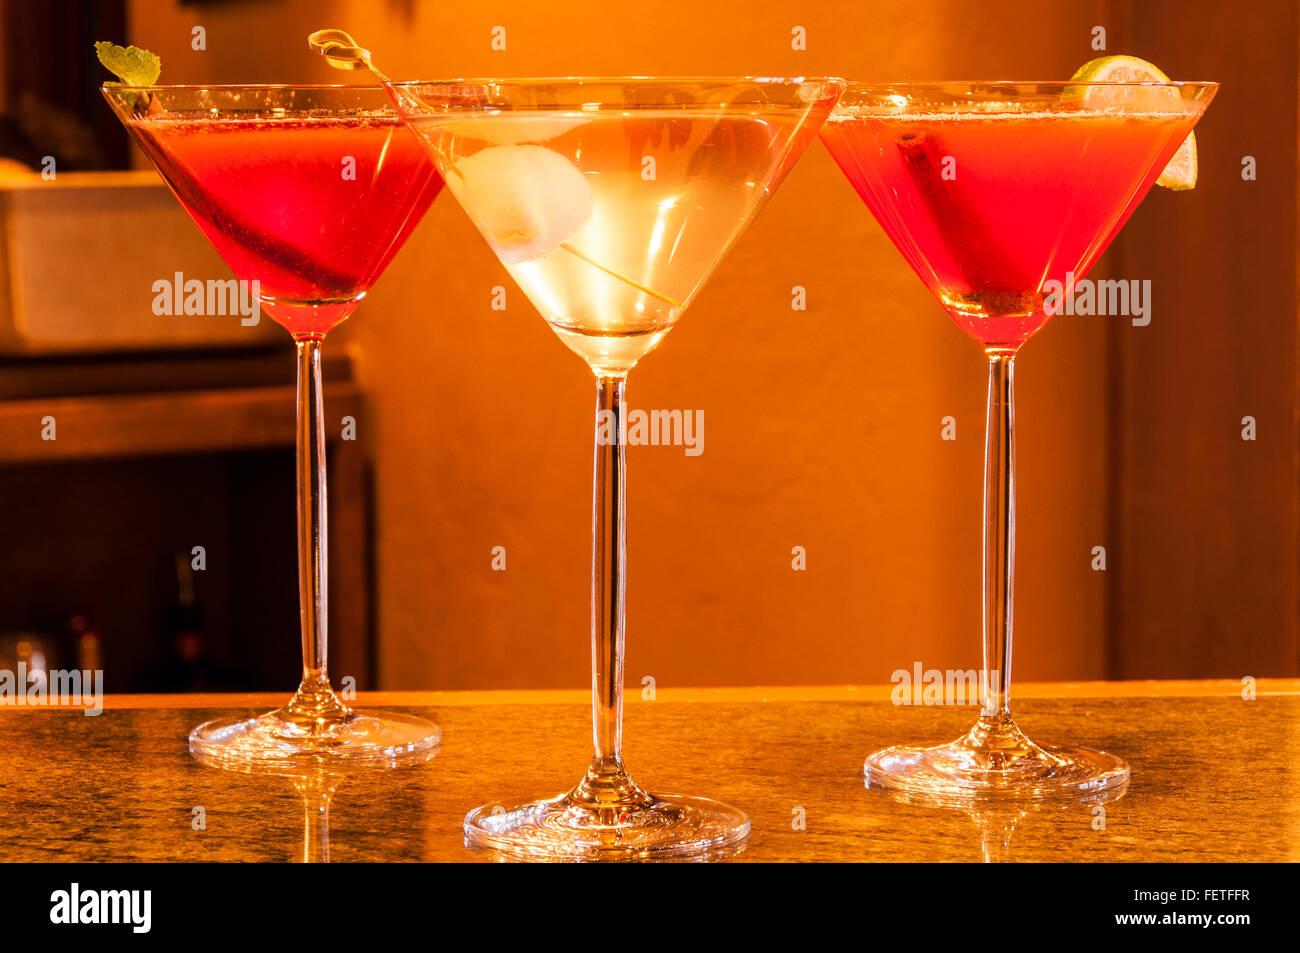 Cocktails, Game Creek Restaurant, Vail Resort, Vail, Colorado. - Stock Image